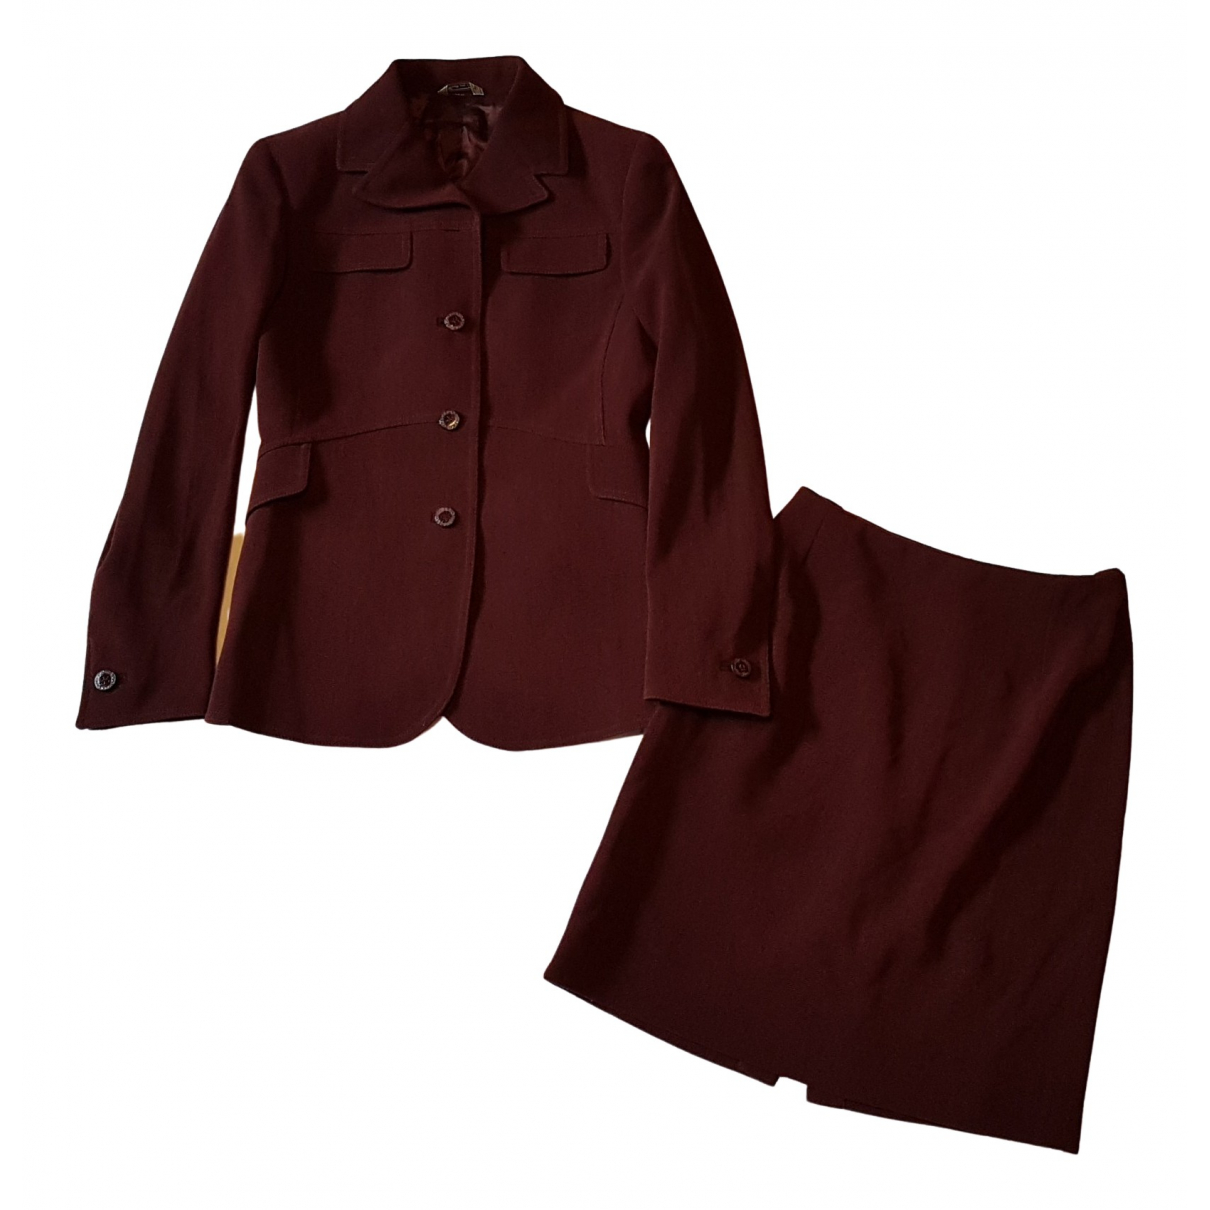 Gianni Versace \N Burgundy Wool jacket for Women 40 IT